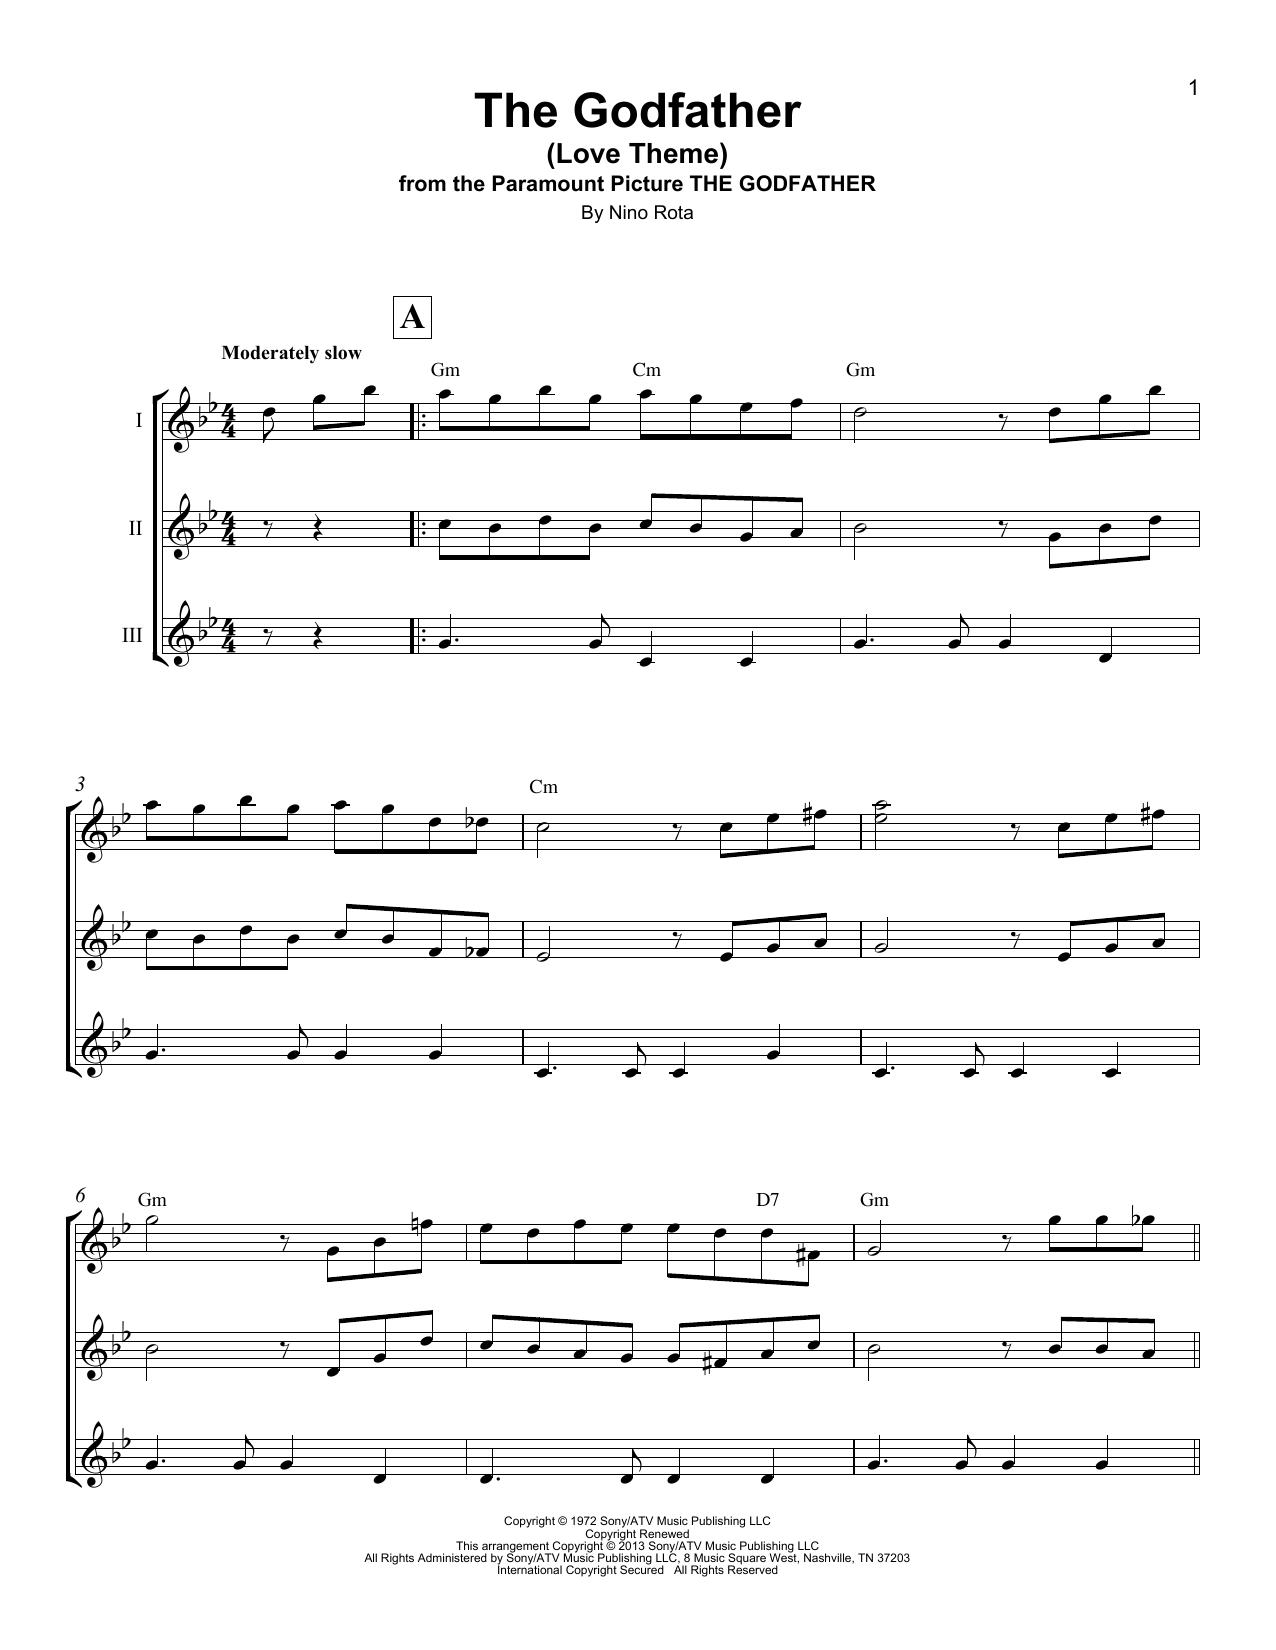 Sheet Music Digital Files To Print Licensed Filmtv Digital Sheet